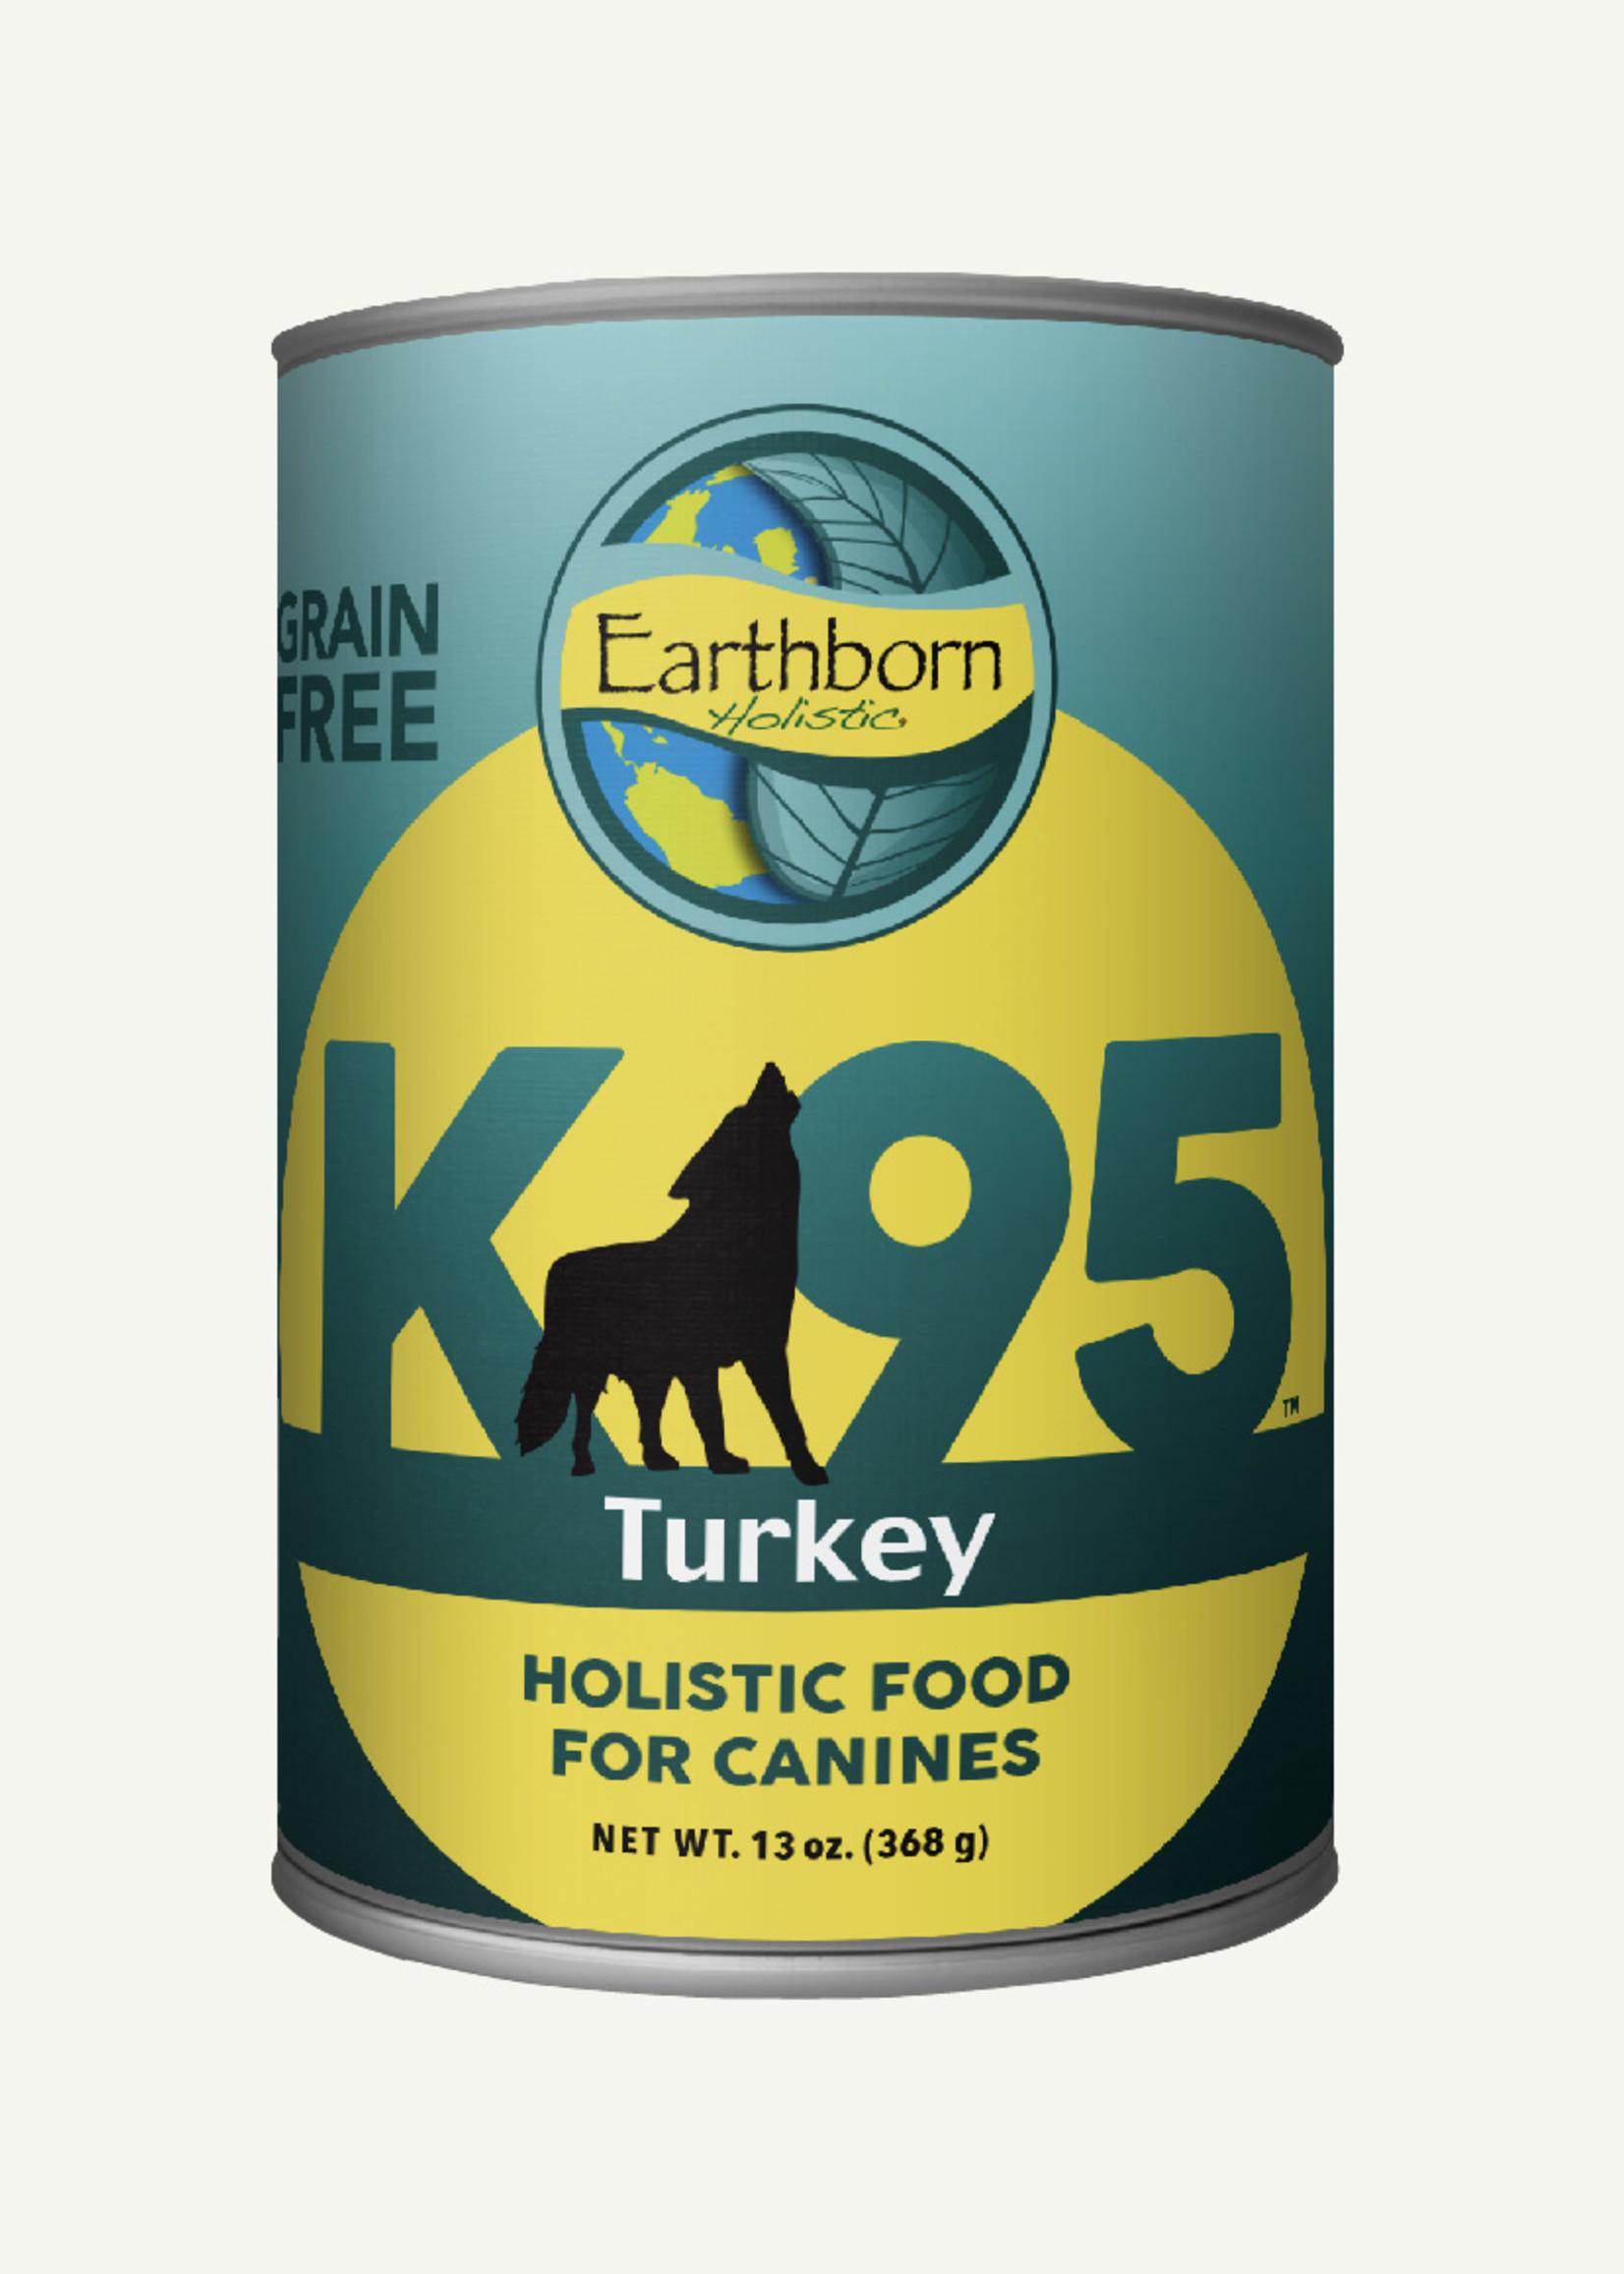 Earthborn Earthborn K95 Turkey Grain Free 13 oz